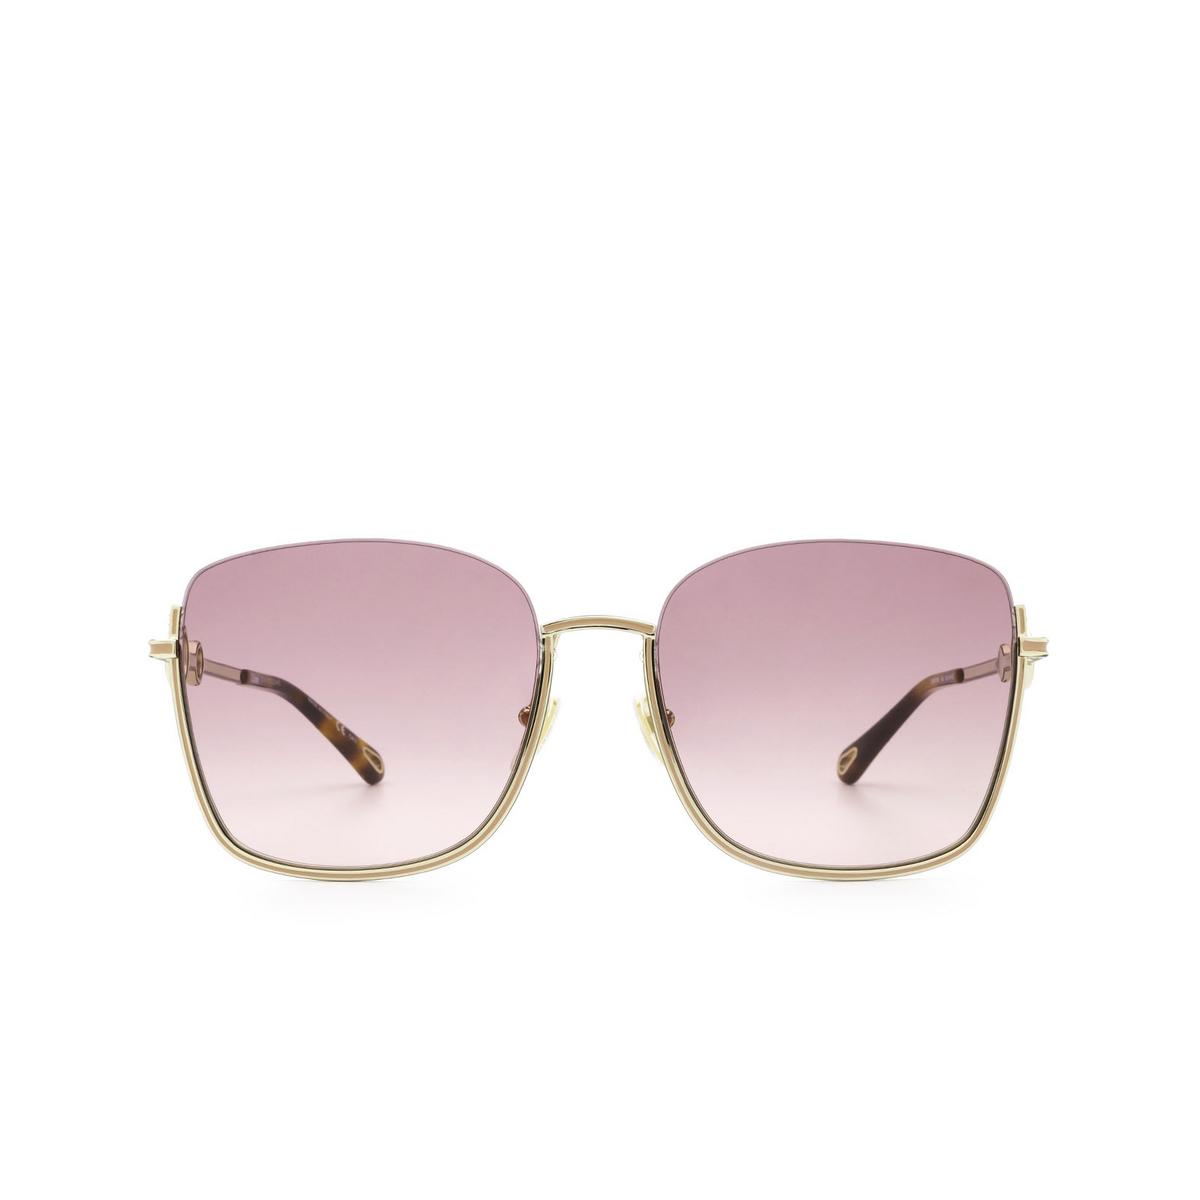 Chloé® Square Sunglasses: CH0070SK color Gold 004 - front view.